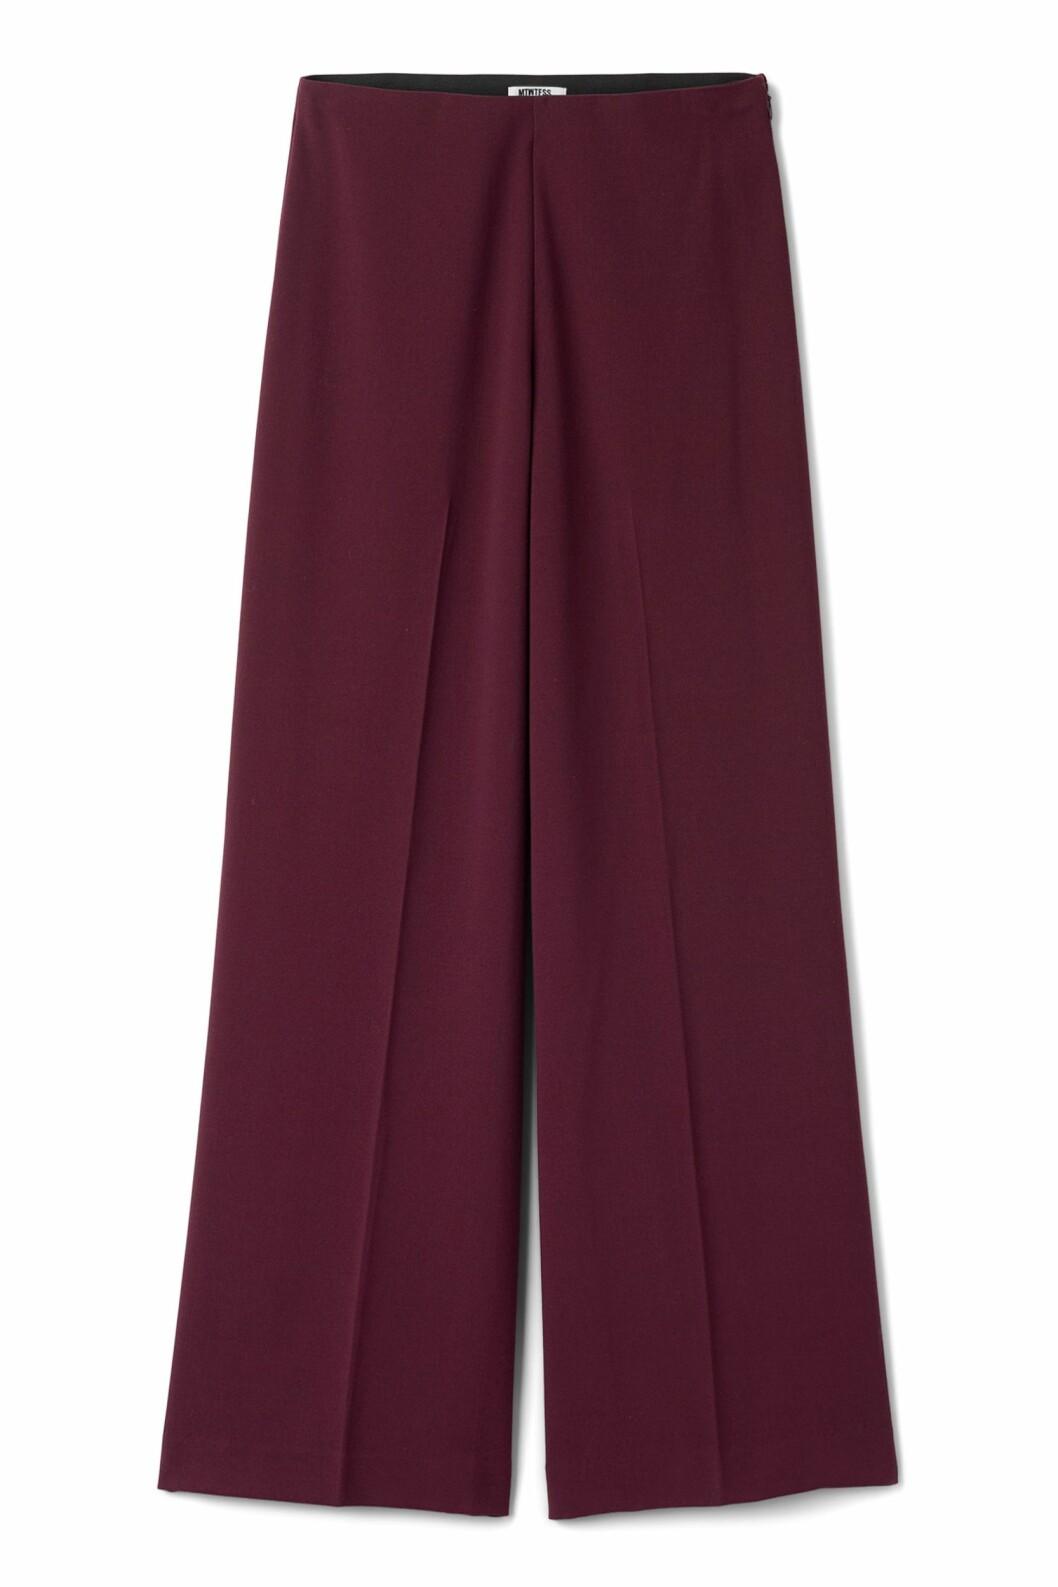 Bukse fra Weekday  500,-  http://shop.weekday.com/se/Womens_shop/New_Arrivals/Julia_trouser/1342358-14610943.1?image=1328240#c-49929